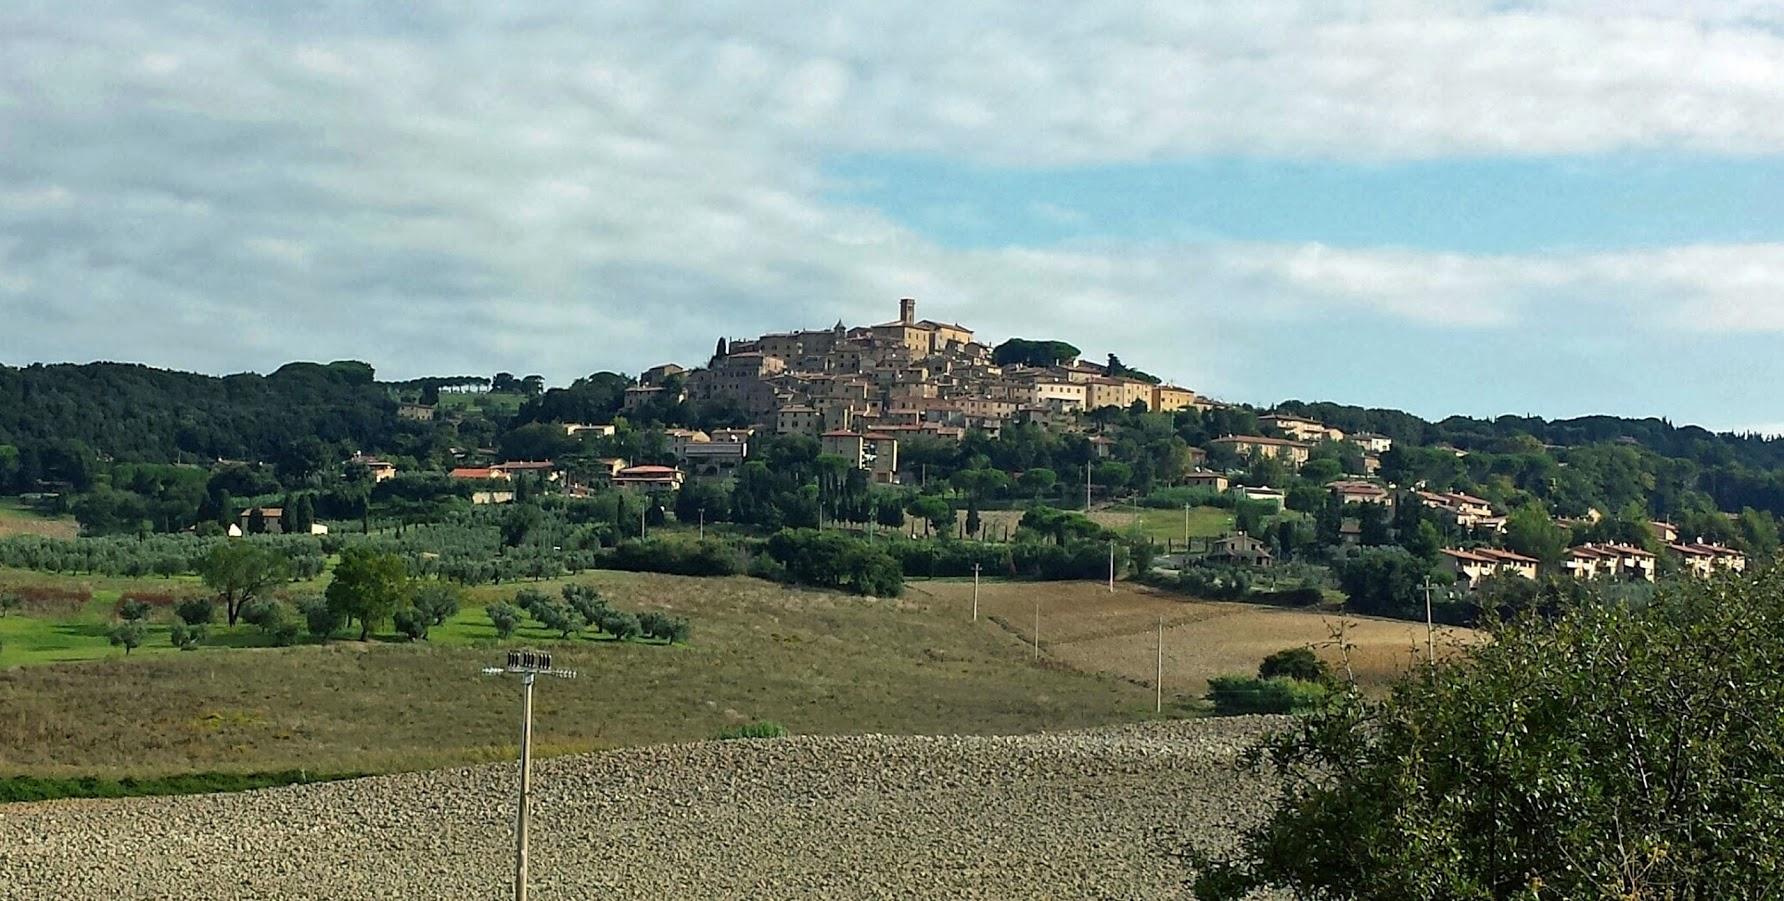 castagneto panorama dalla bolgherese - Borghi Medievali - Hotel I Ginepri